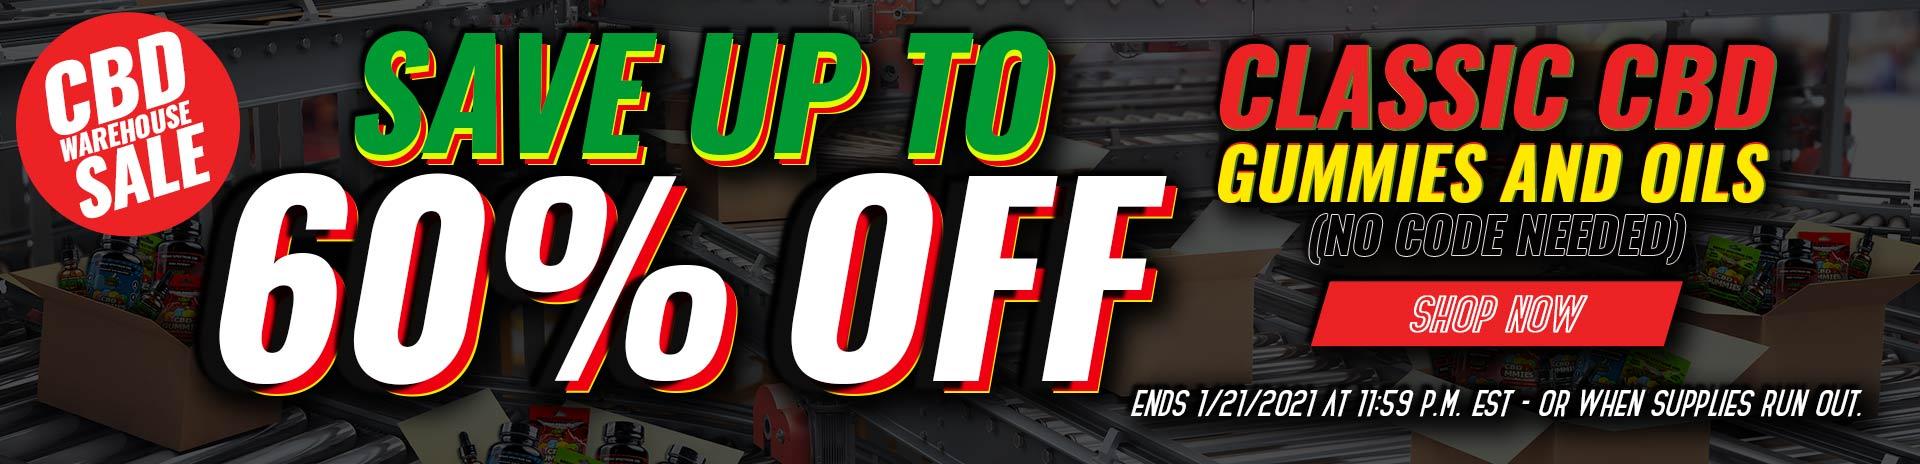 Hemp Bombs Warehouse Sale Banner